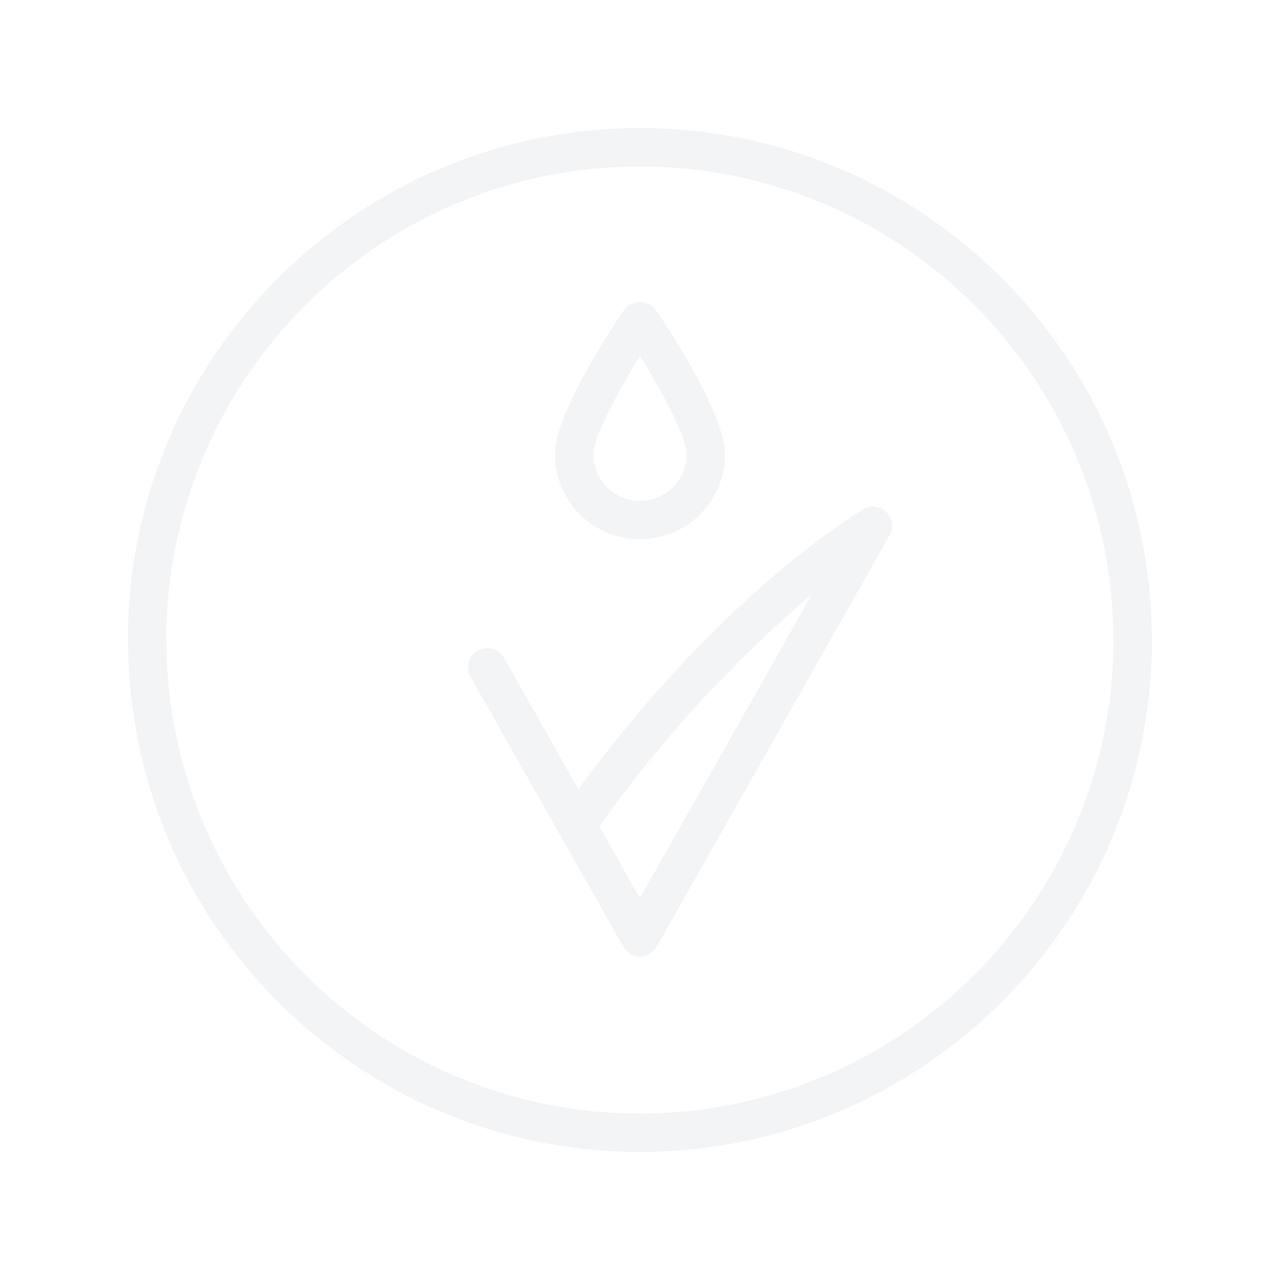 BOURJOIS LIner Feutre Eyeliner 0.8ml